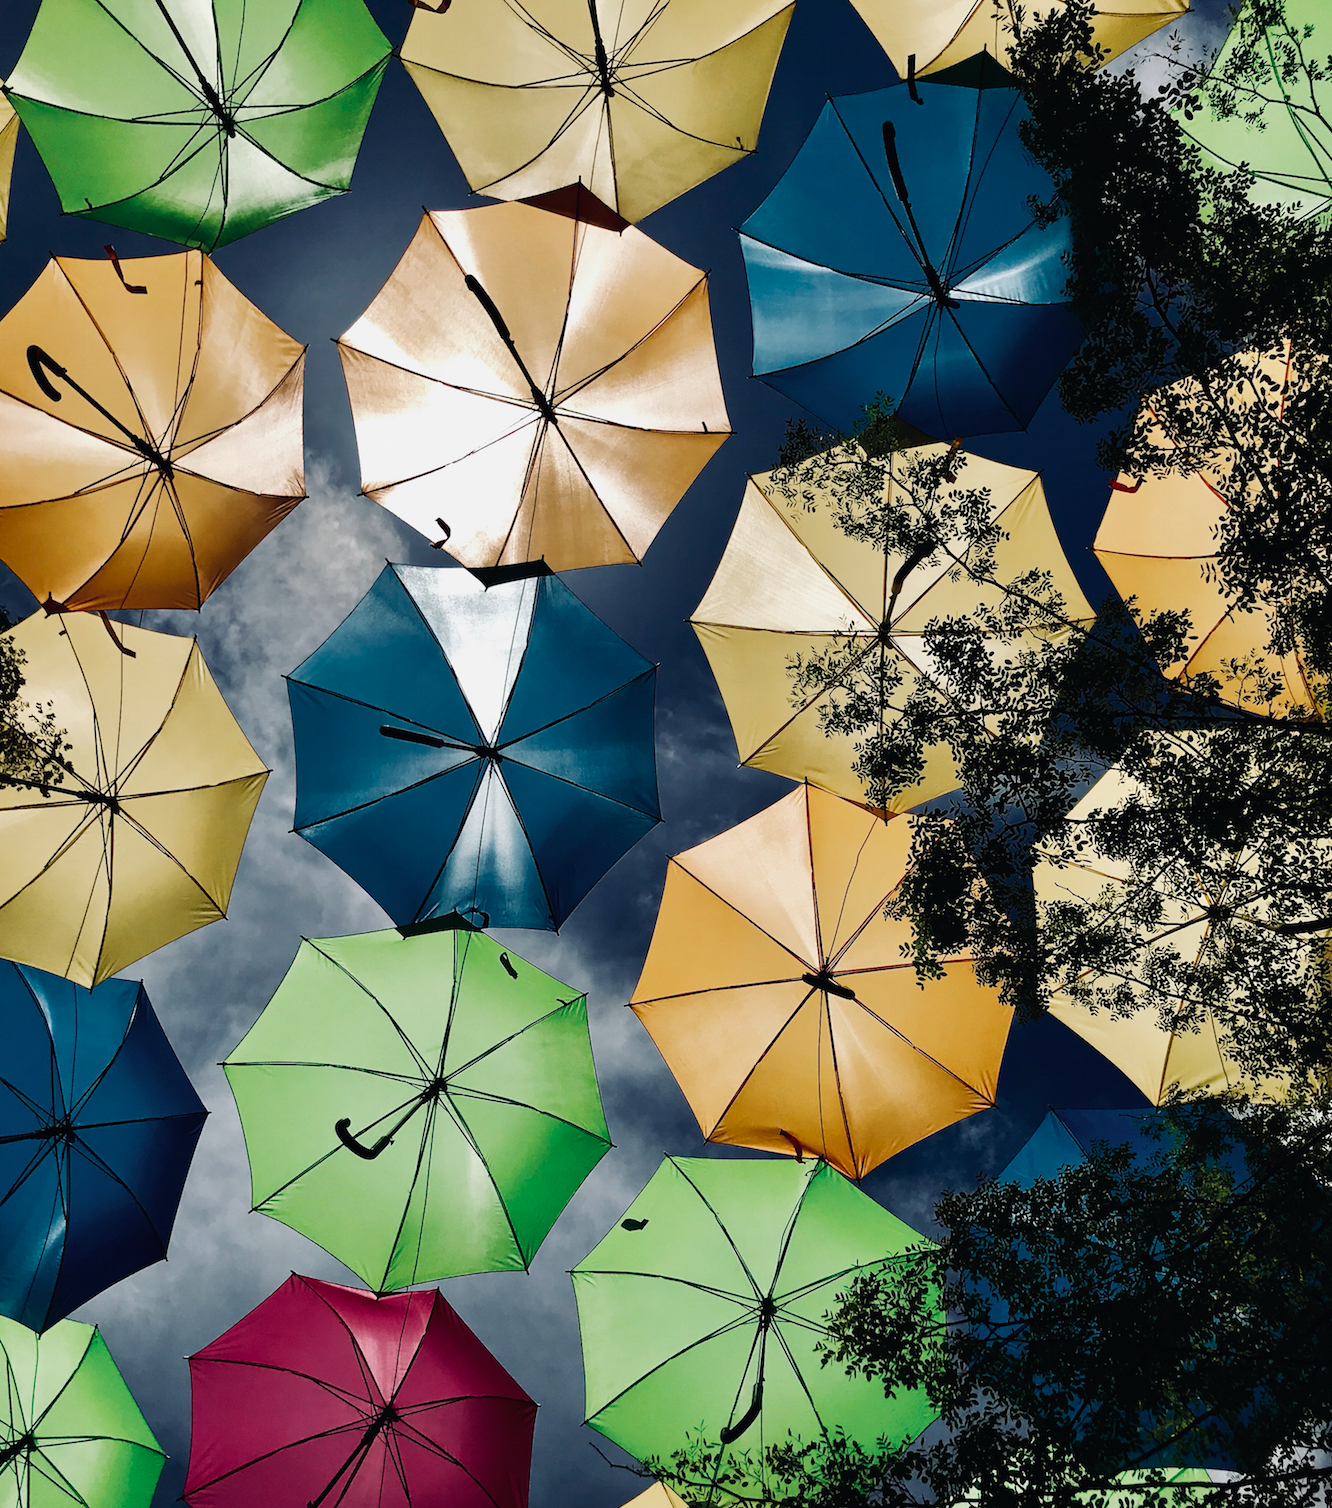 The Umbrella Sky